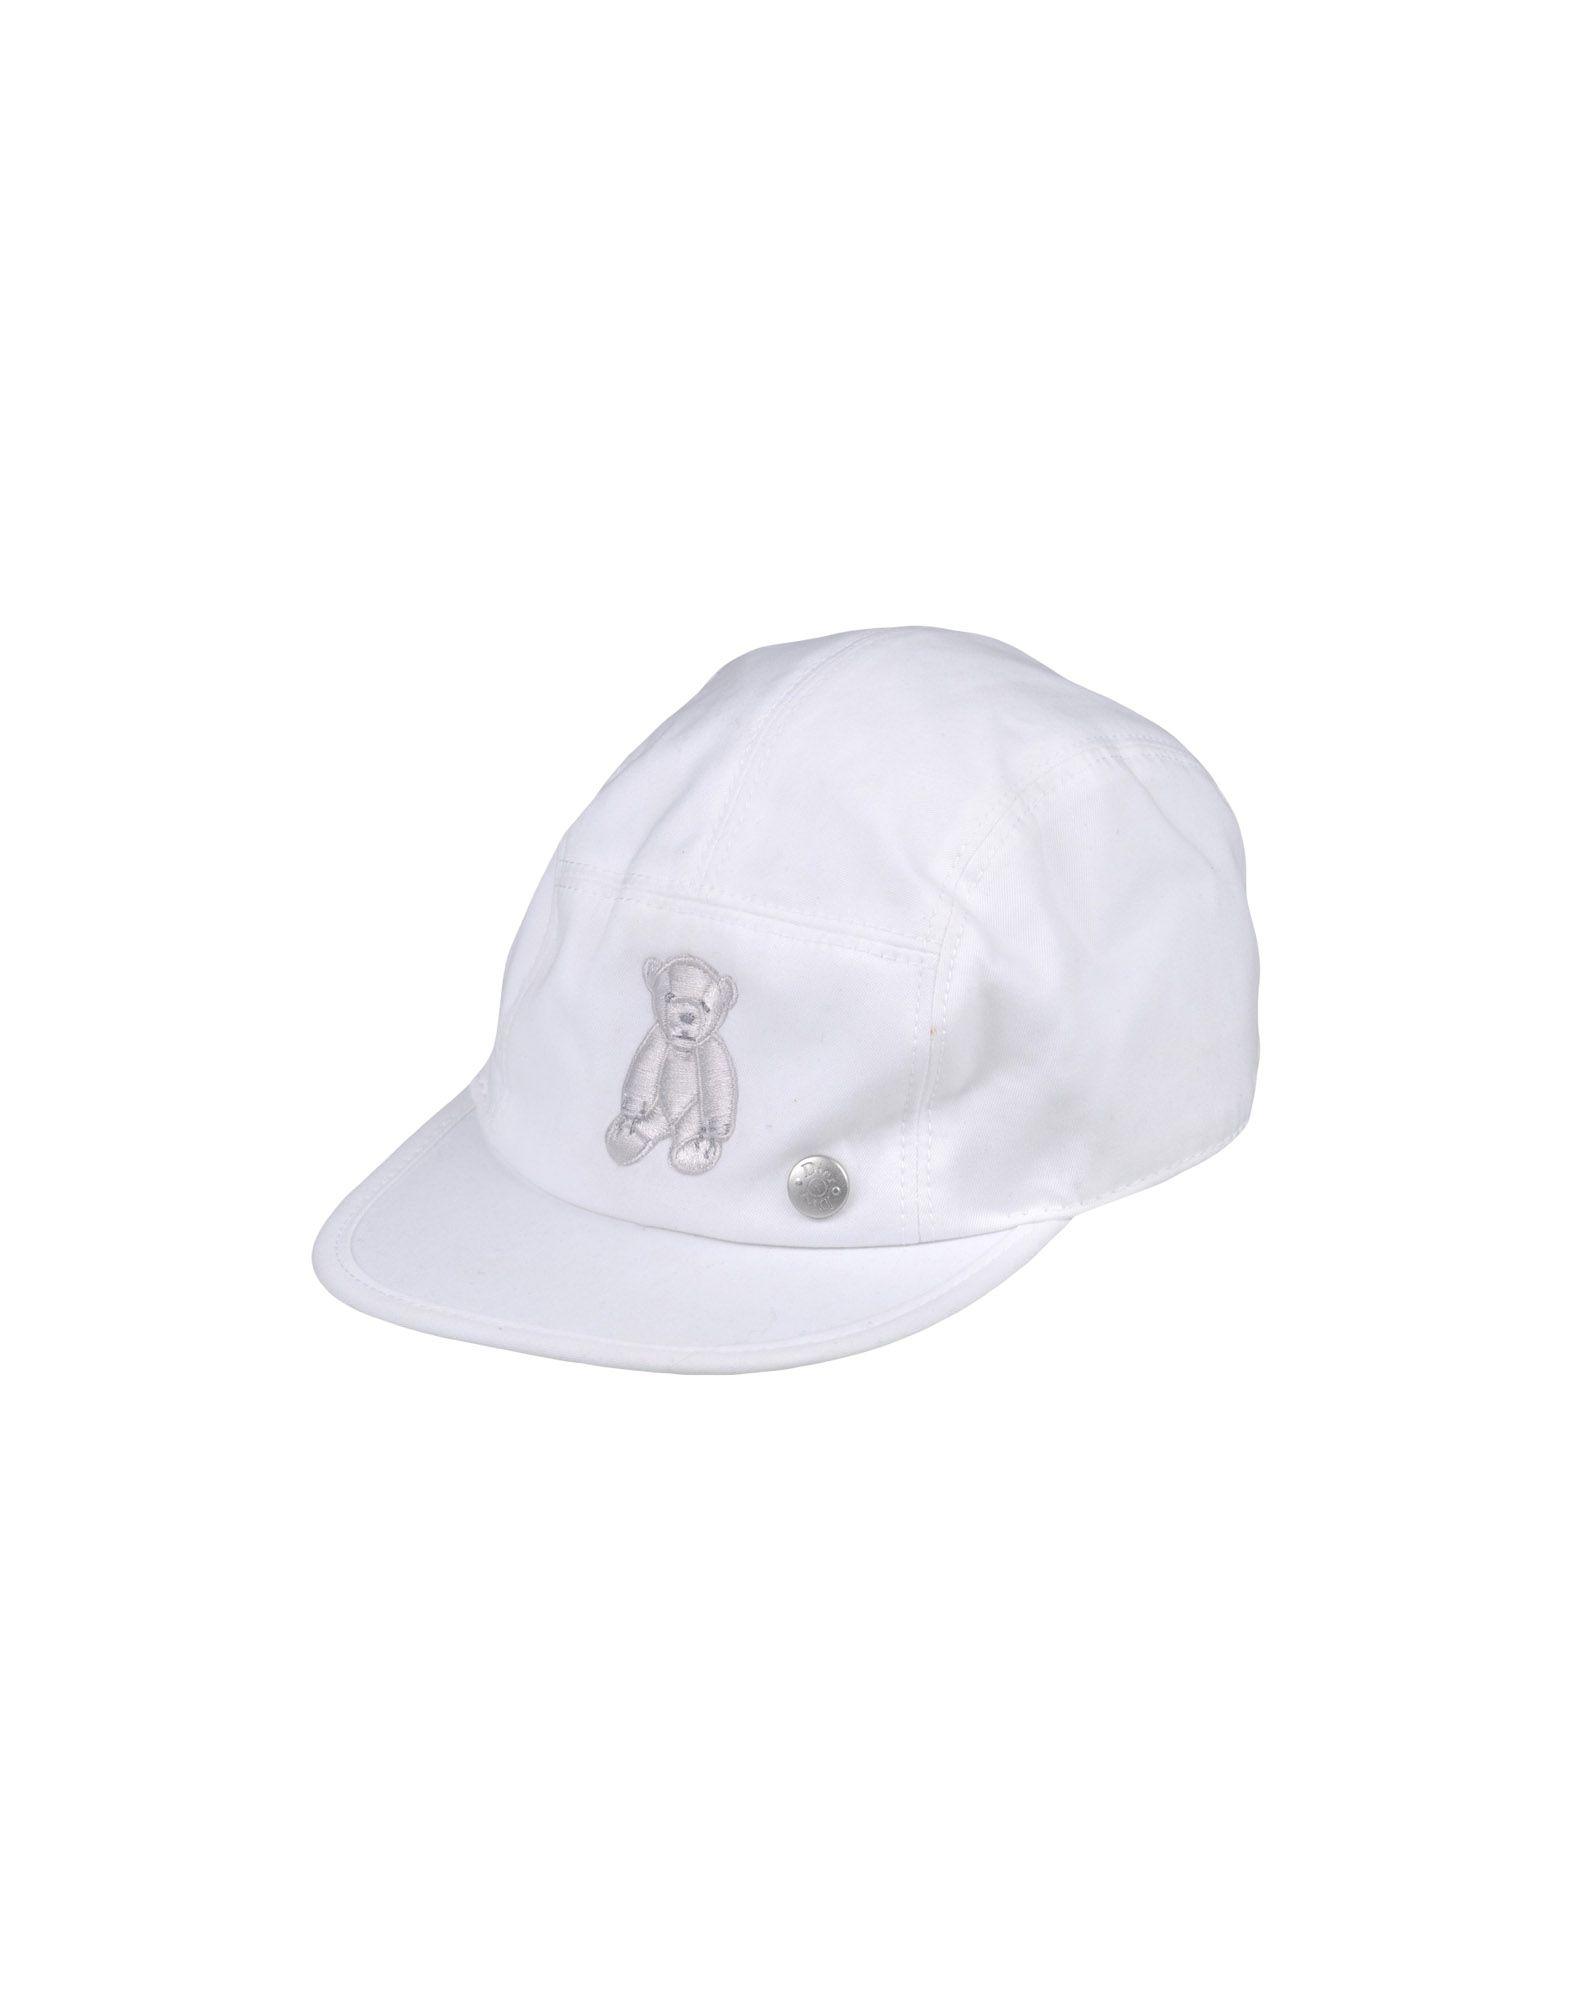 Baby Dior Hat Boy 0-24 months online on YOOX United States 9e36f227db6